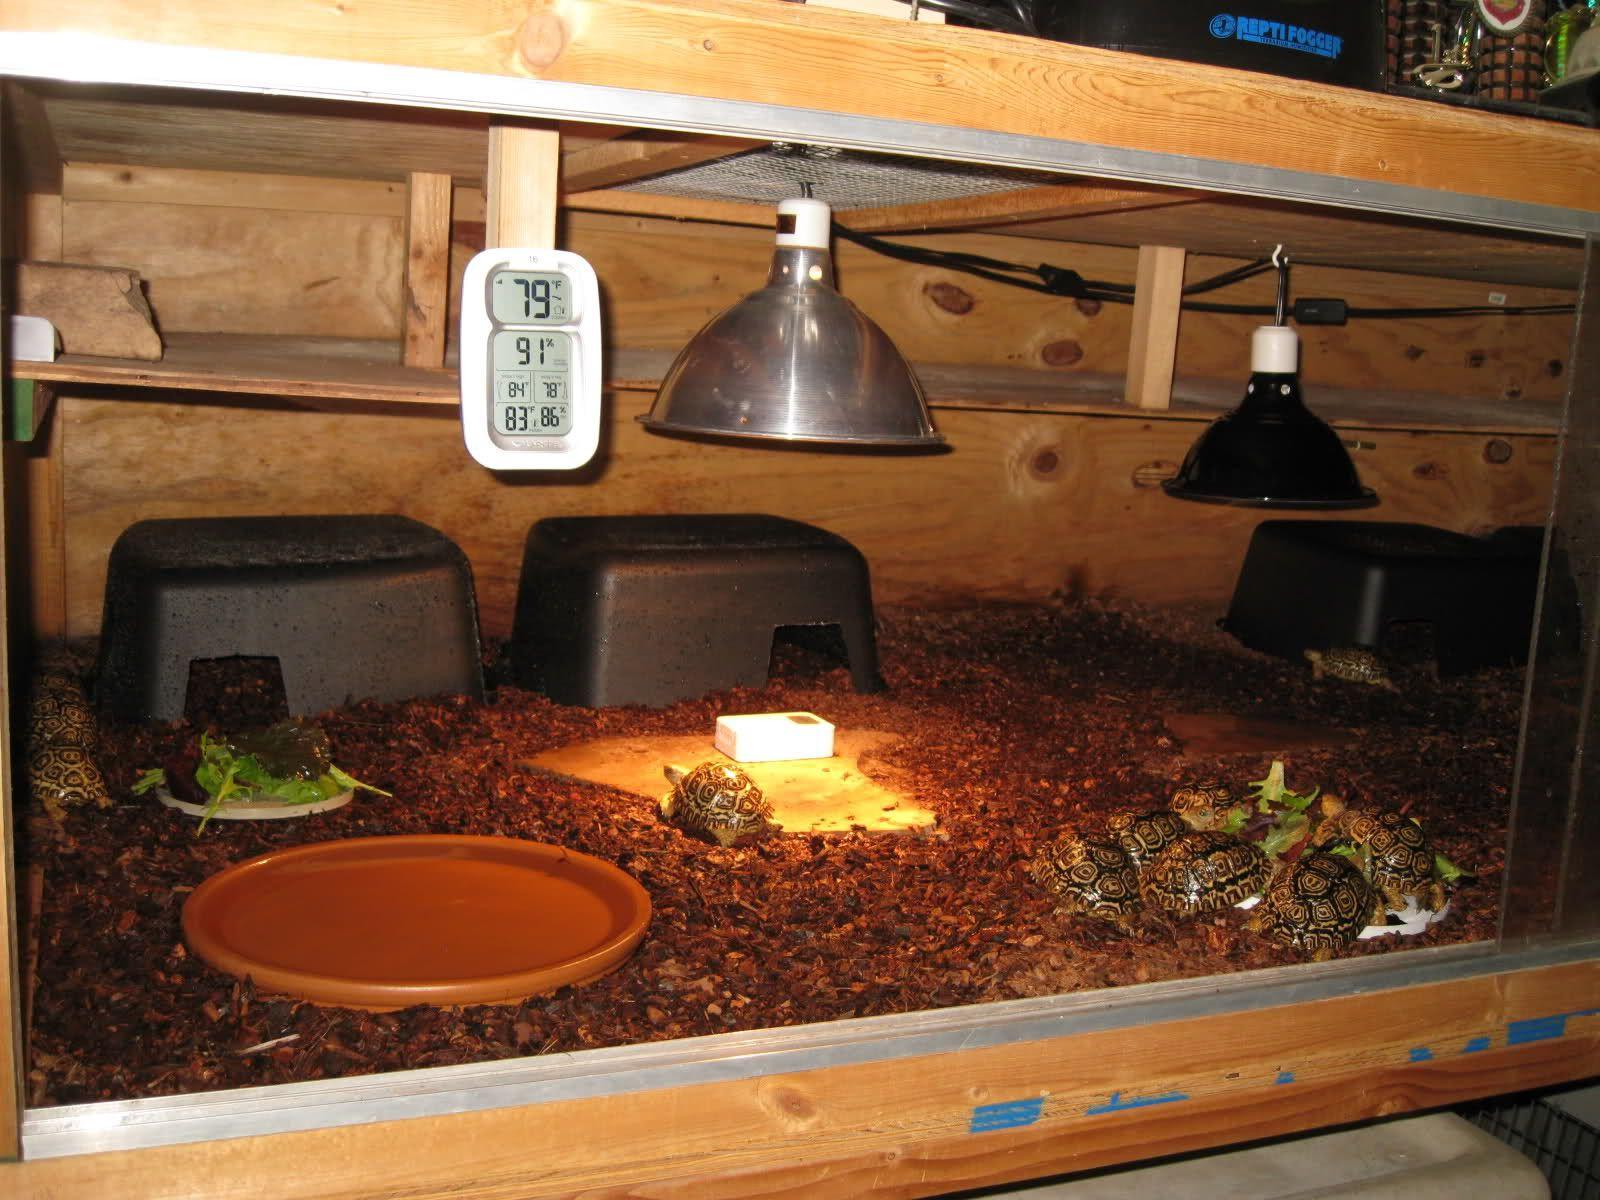 Closed chamber enclosuresa closed chamber tort enclosure helps to closed chamber enclosuresa closed chamber tort enclosure helps to retain humidity tortoise tabletortoise aloadofball Gallery